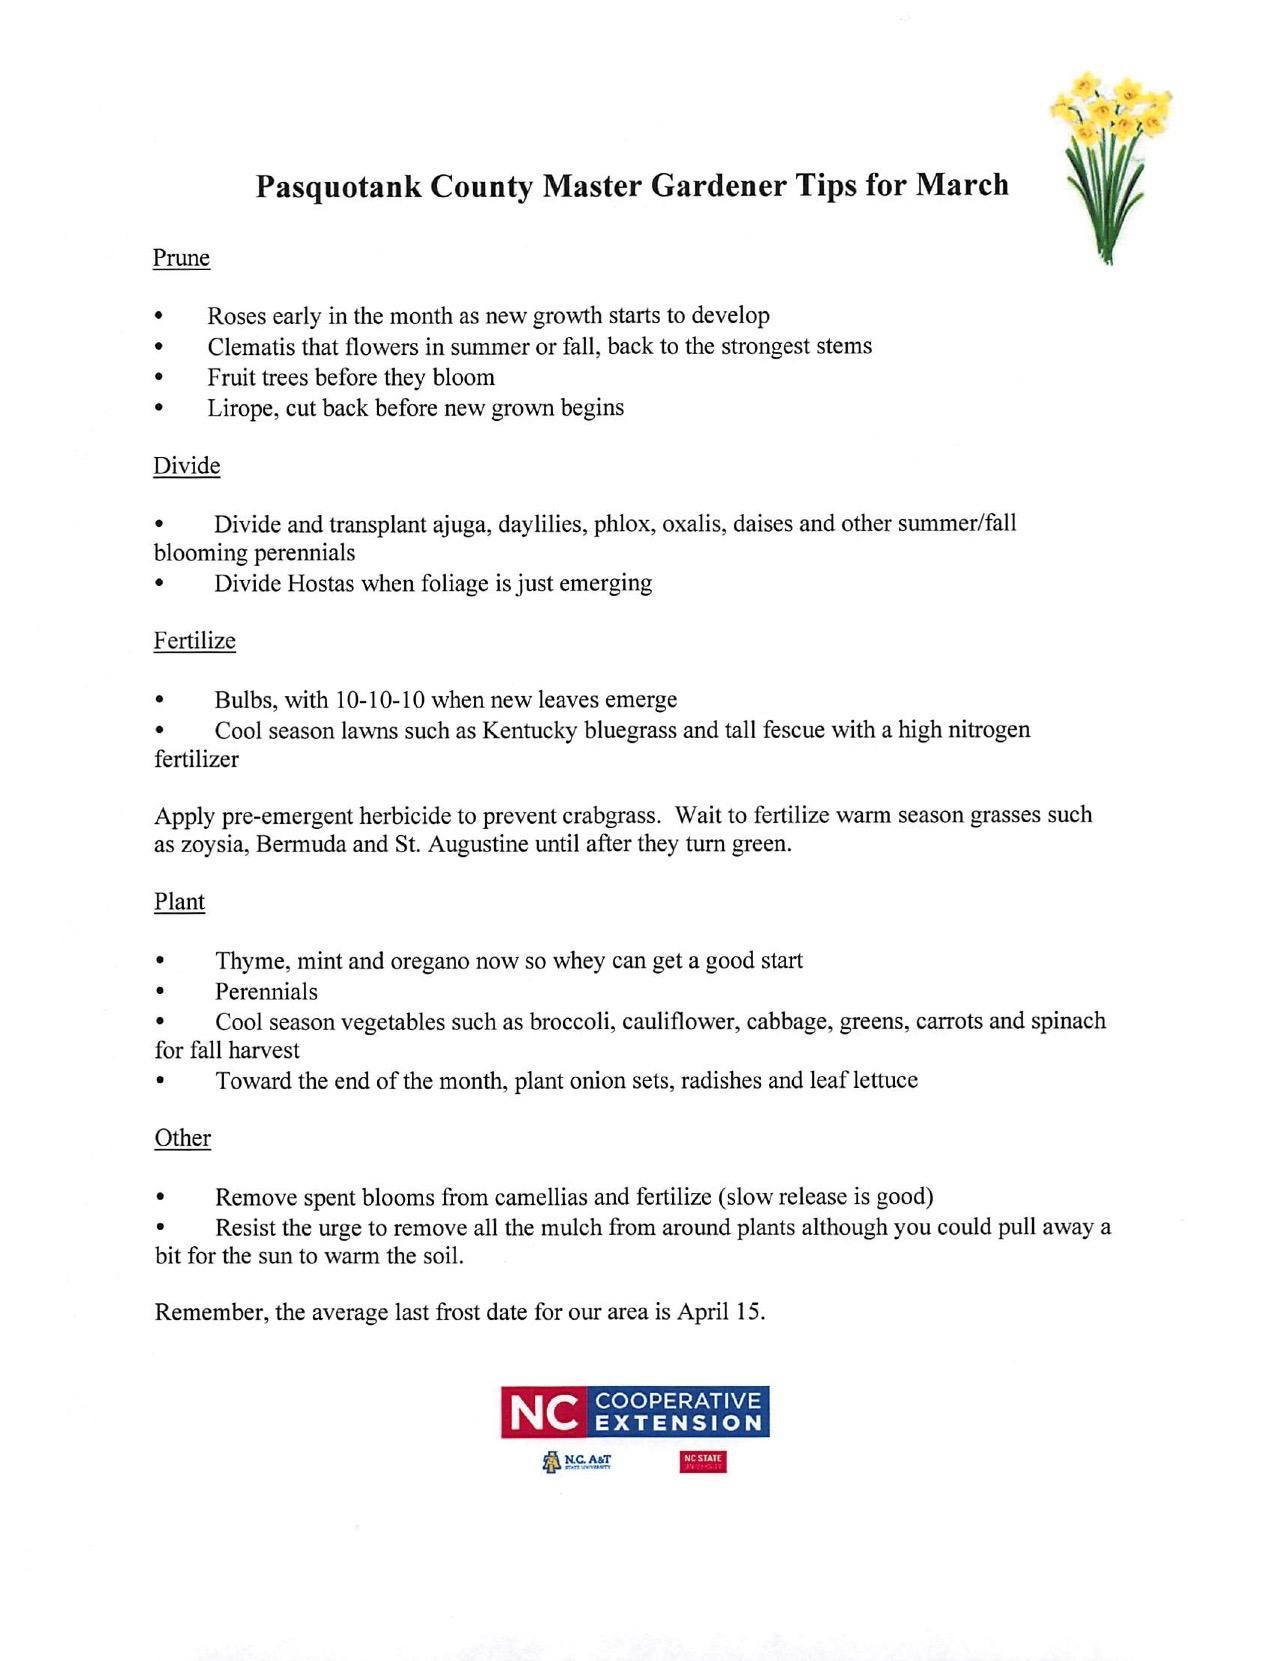 march gardening tips